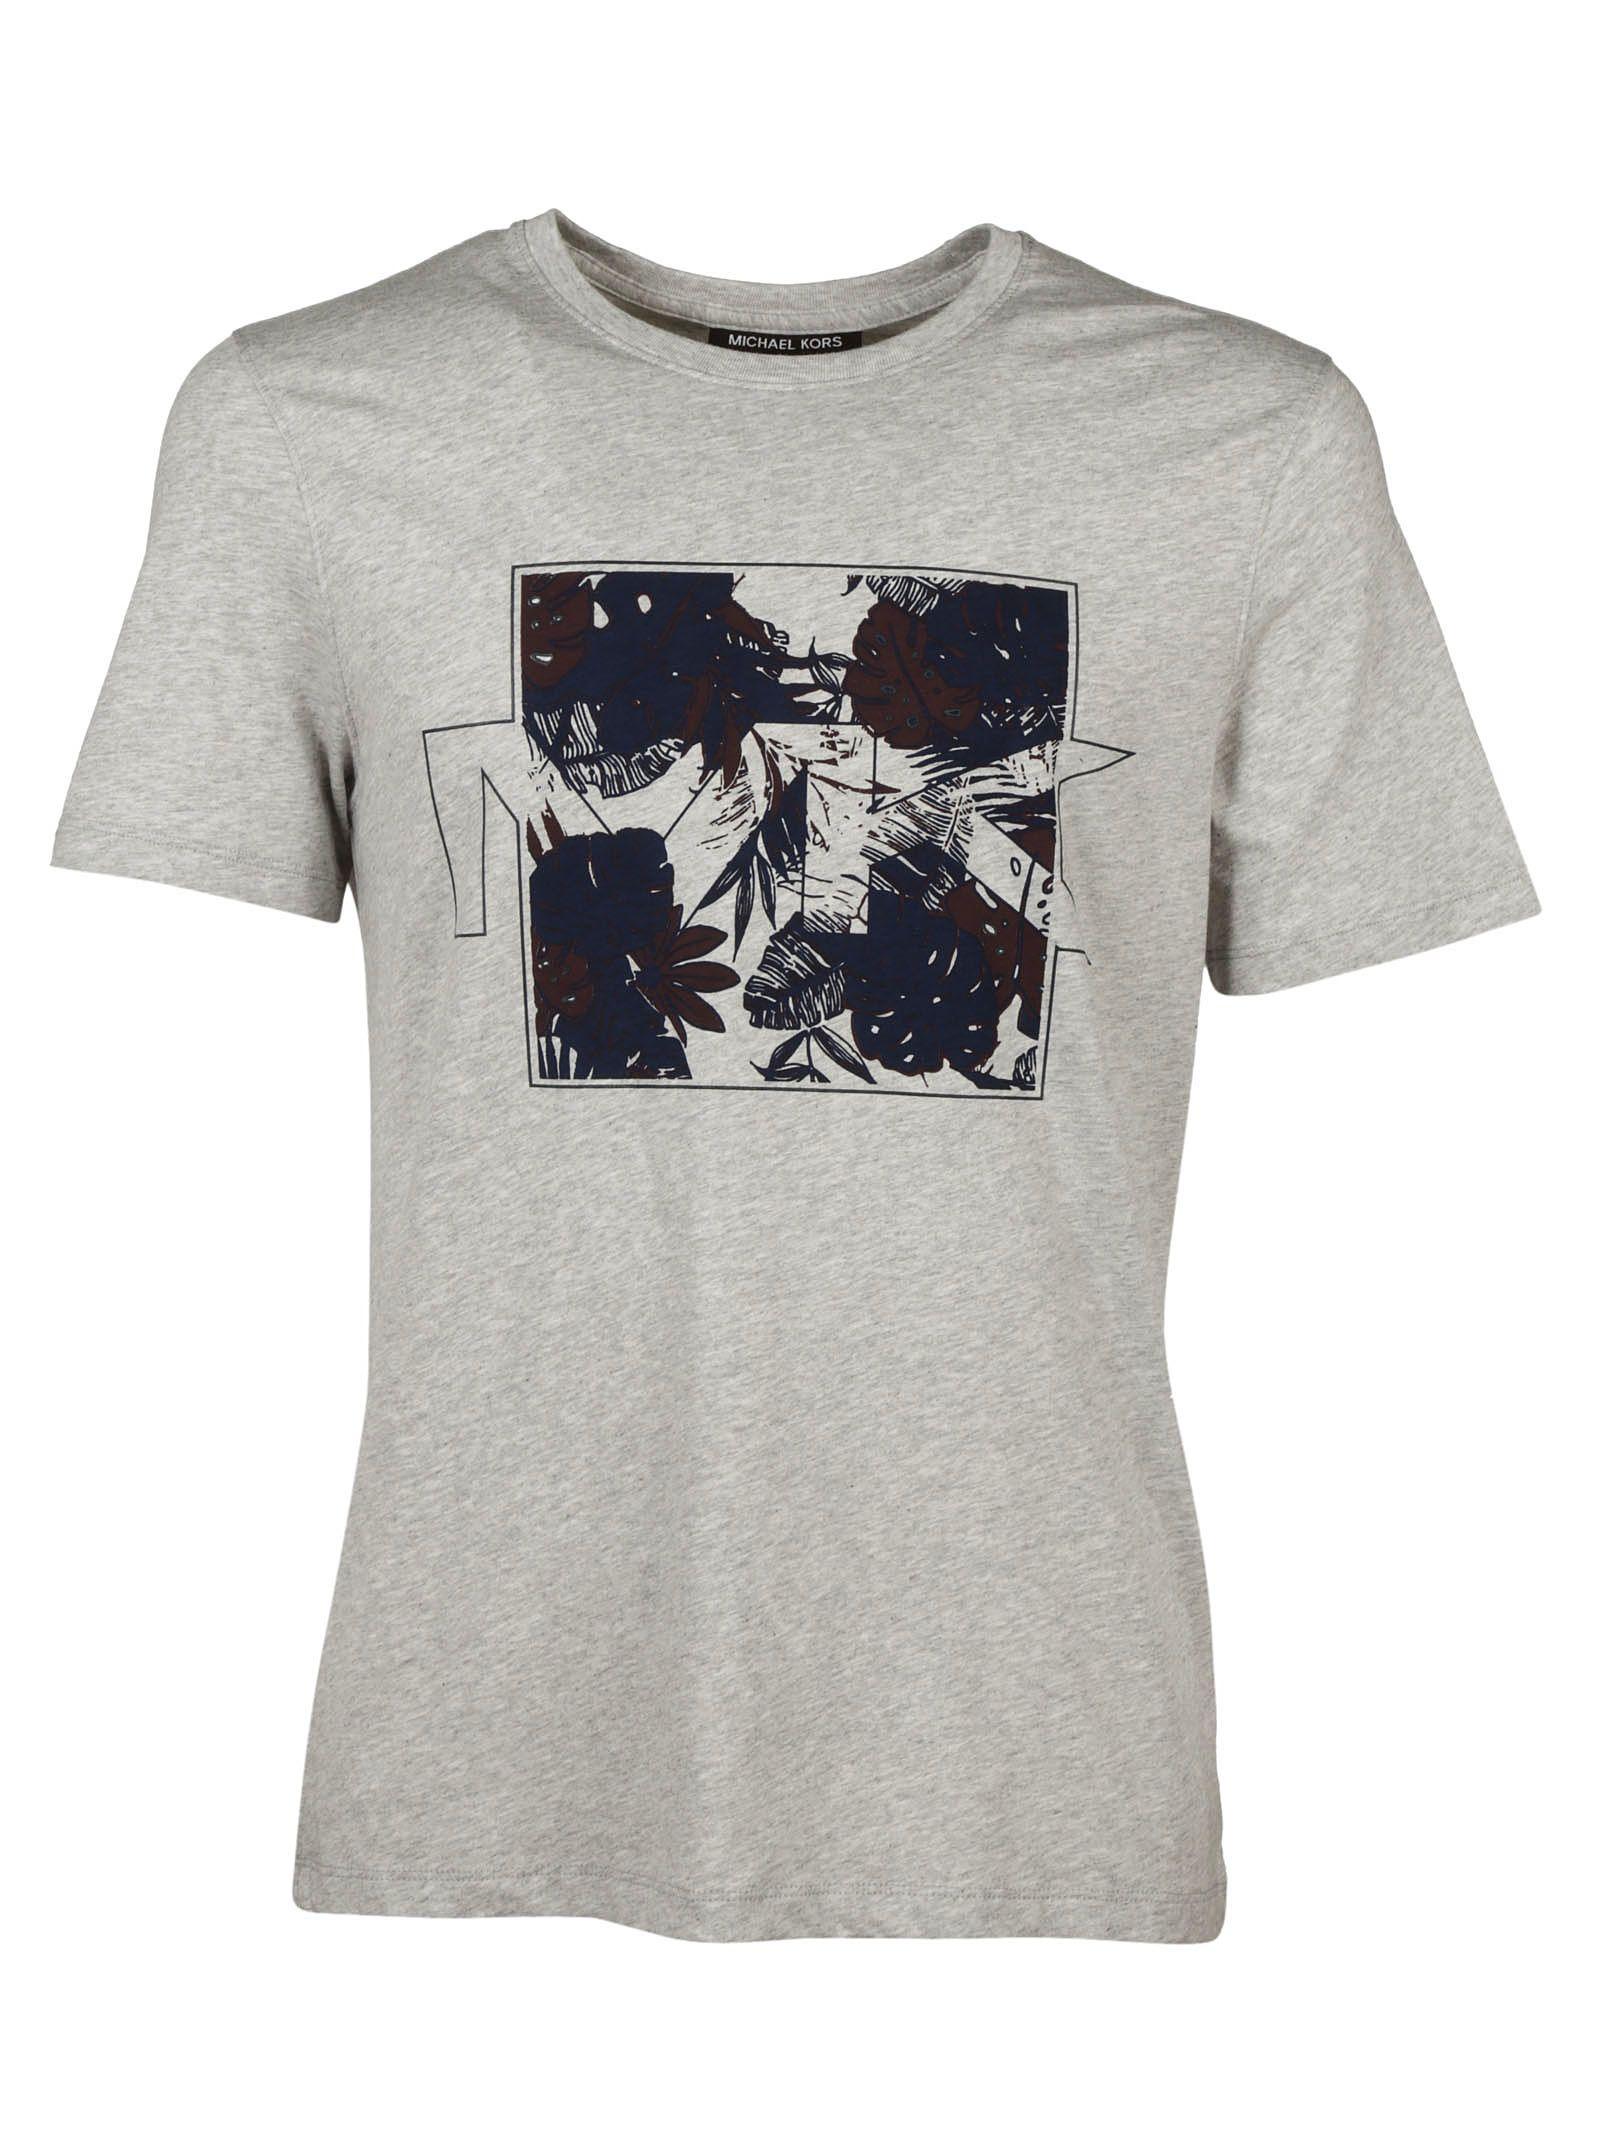 michael kors michael kors printed t shirt heather grey. Black Bedroom Furniture Sets. Home Design Ideas